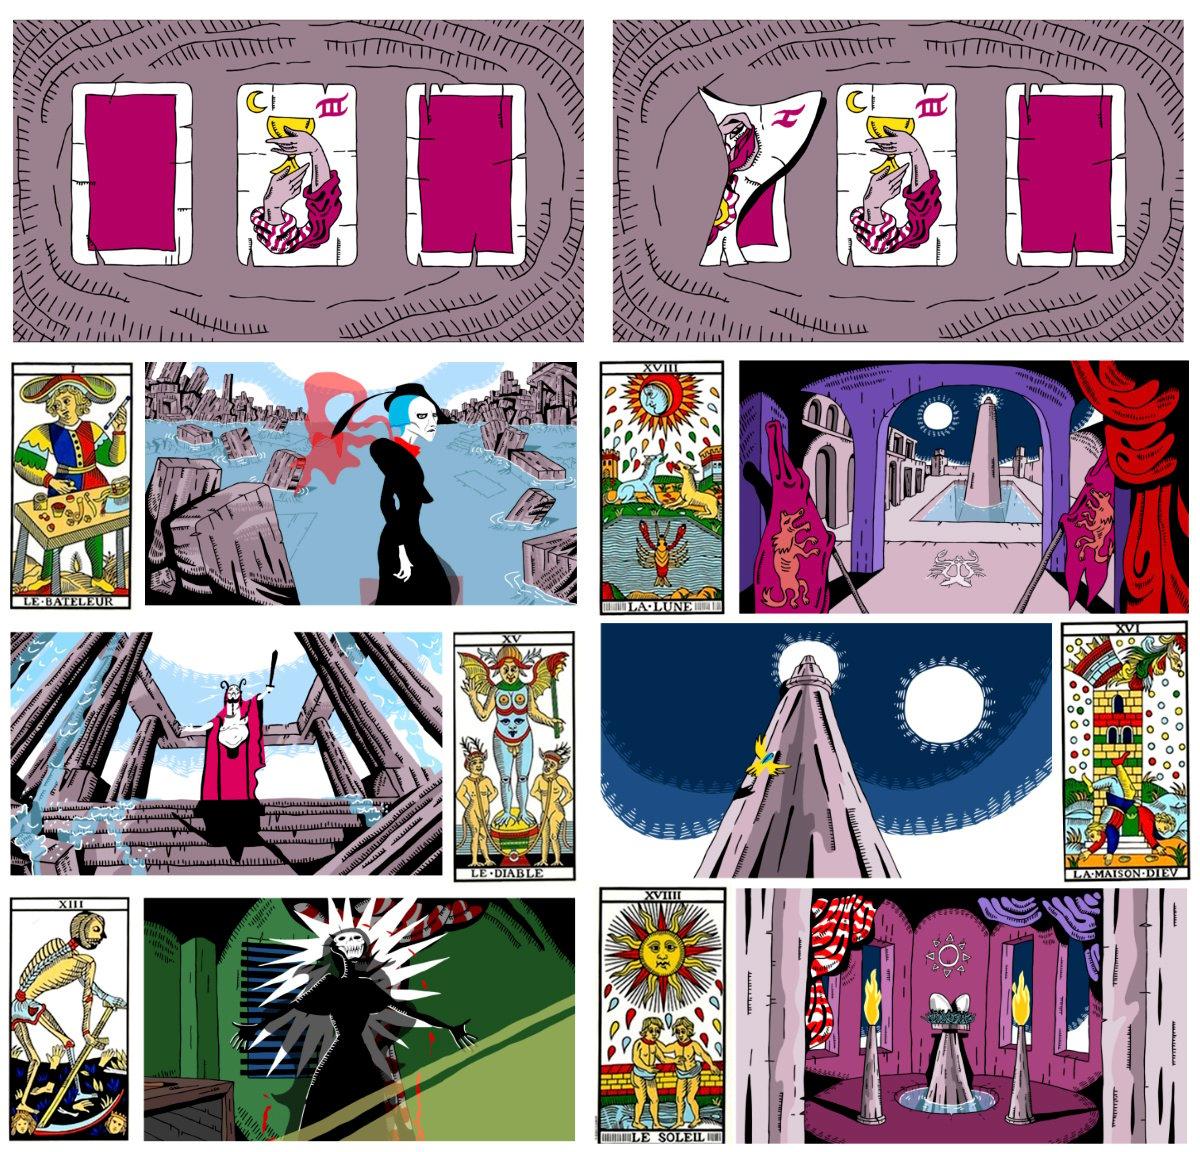 Medea - Tarot Card Imagery